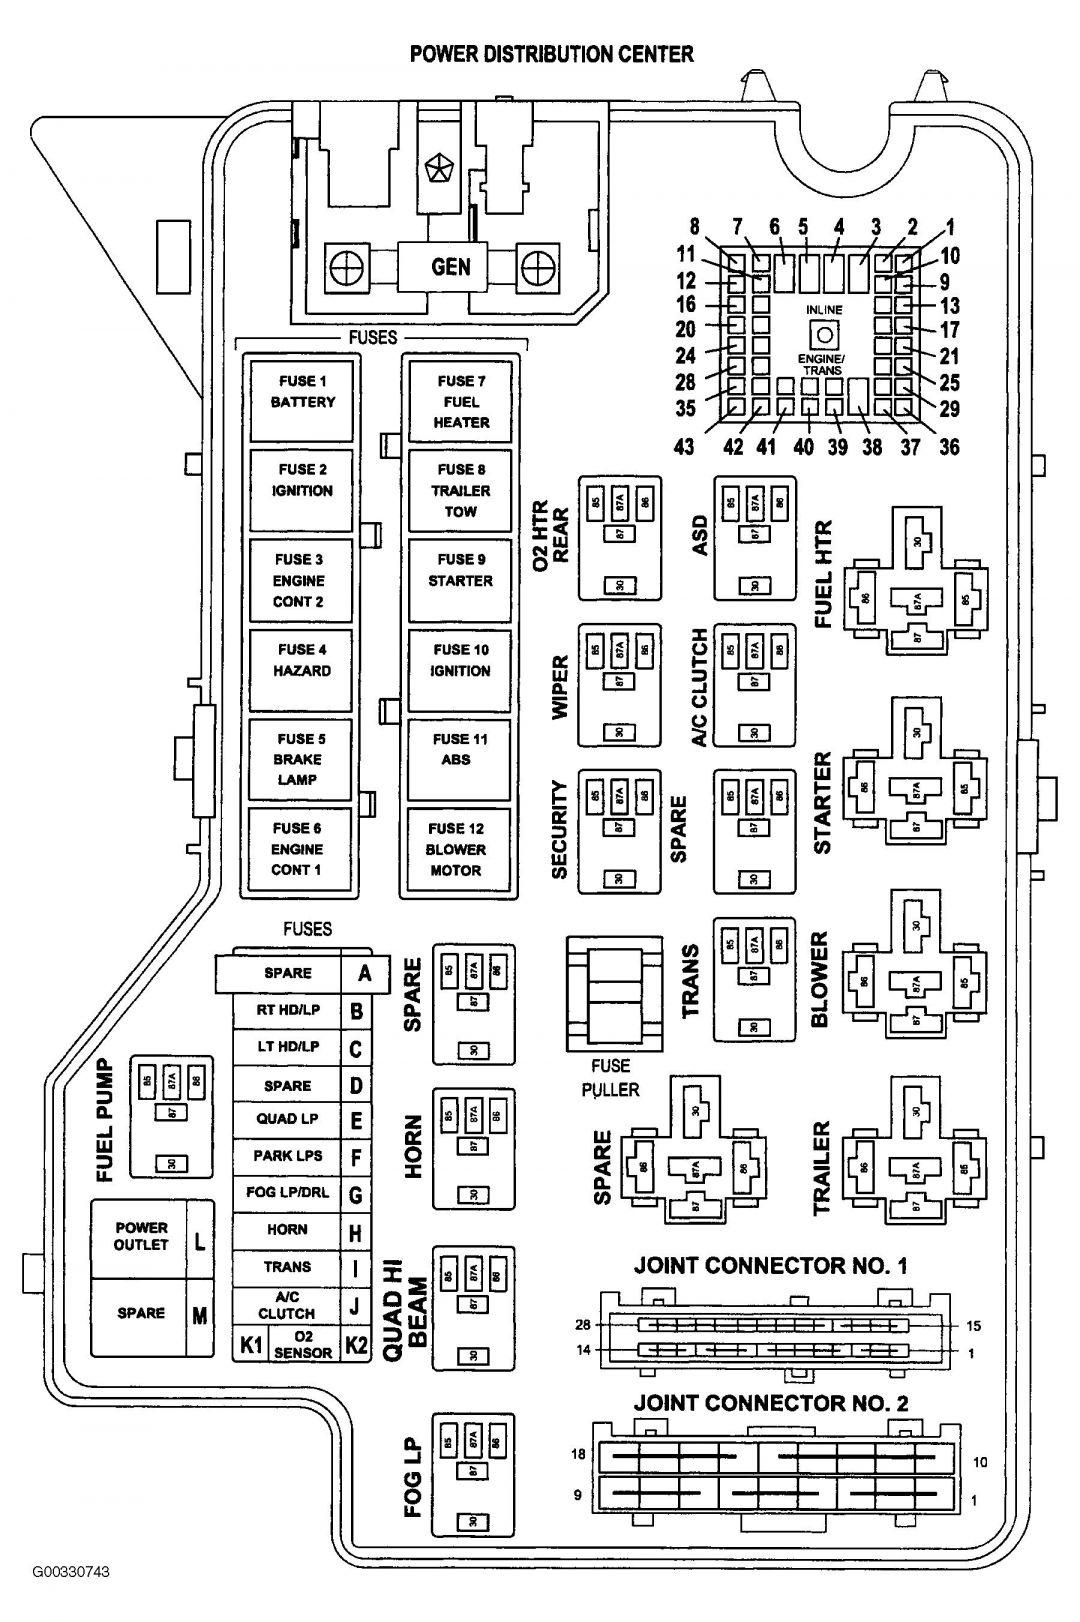 16 1986 Dodge Truck Wiring Diagram Truck Diagram Wiringg Net Dodge Ram 1500 Dodge Trucks Ram Ram 1500